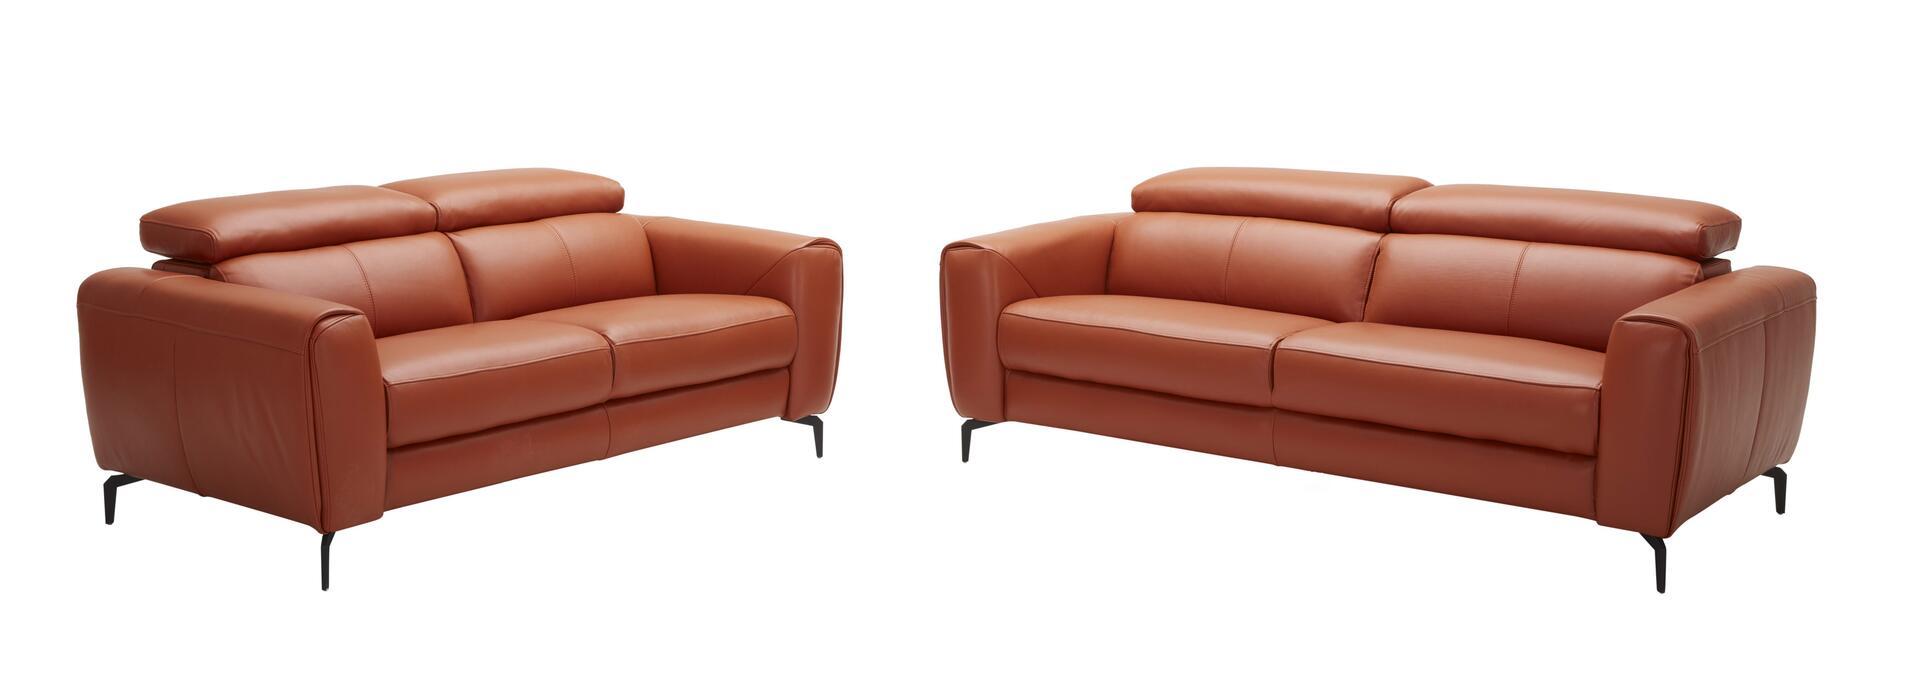 J And M Furniture 18742sl Cooper Living Room Sets Appliances Connection